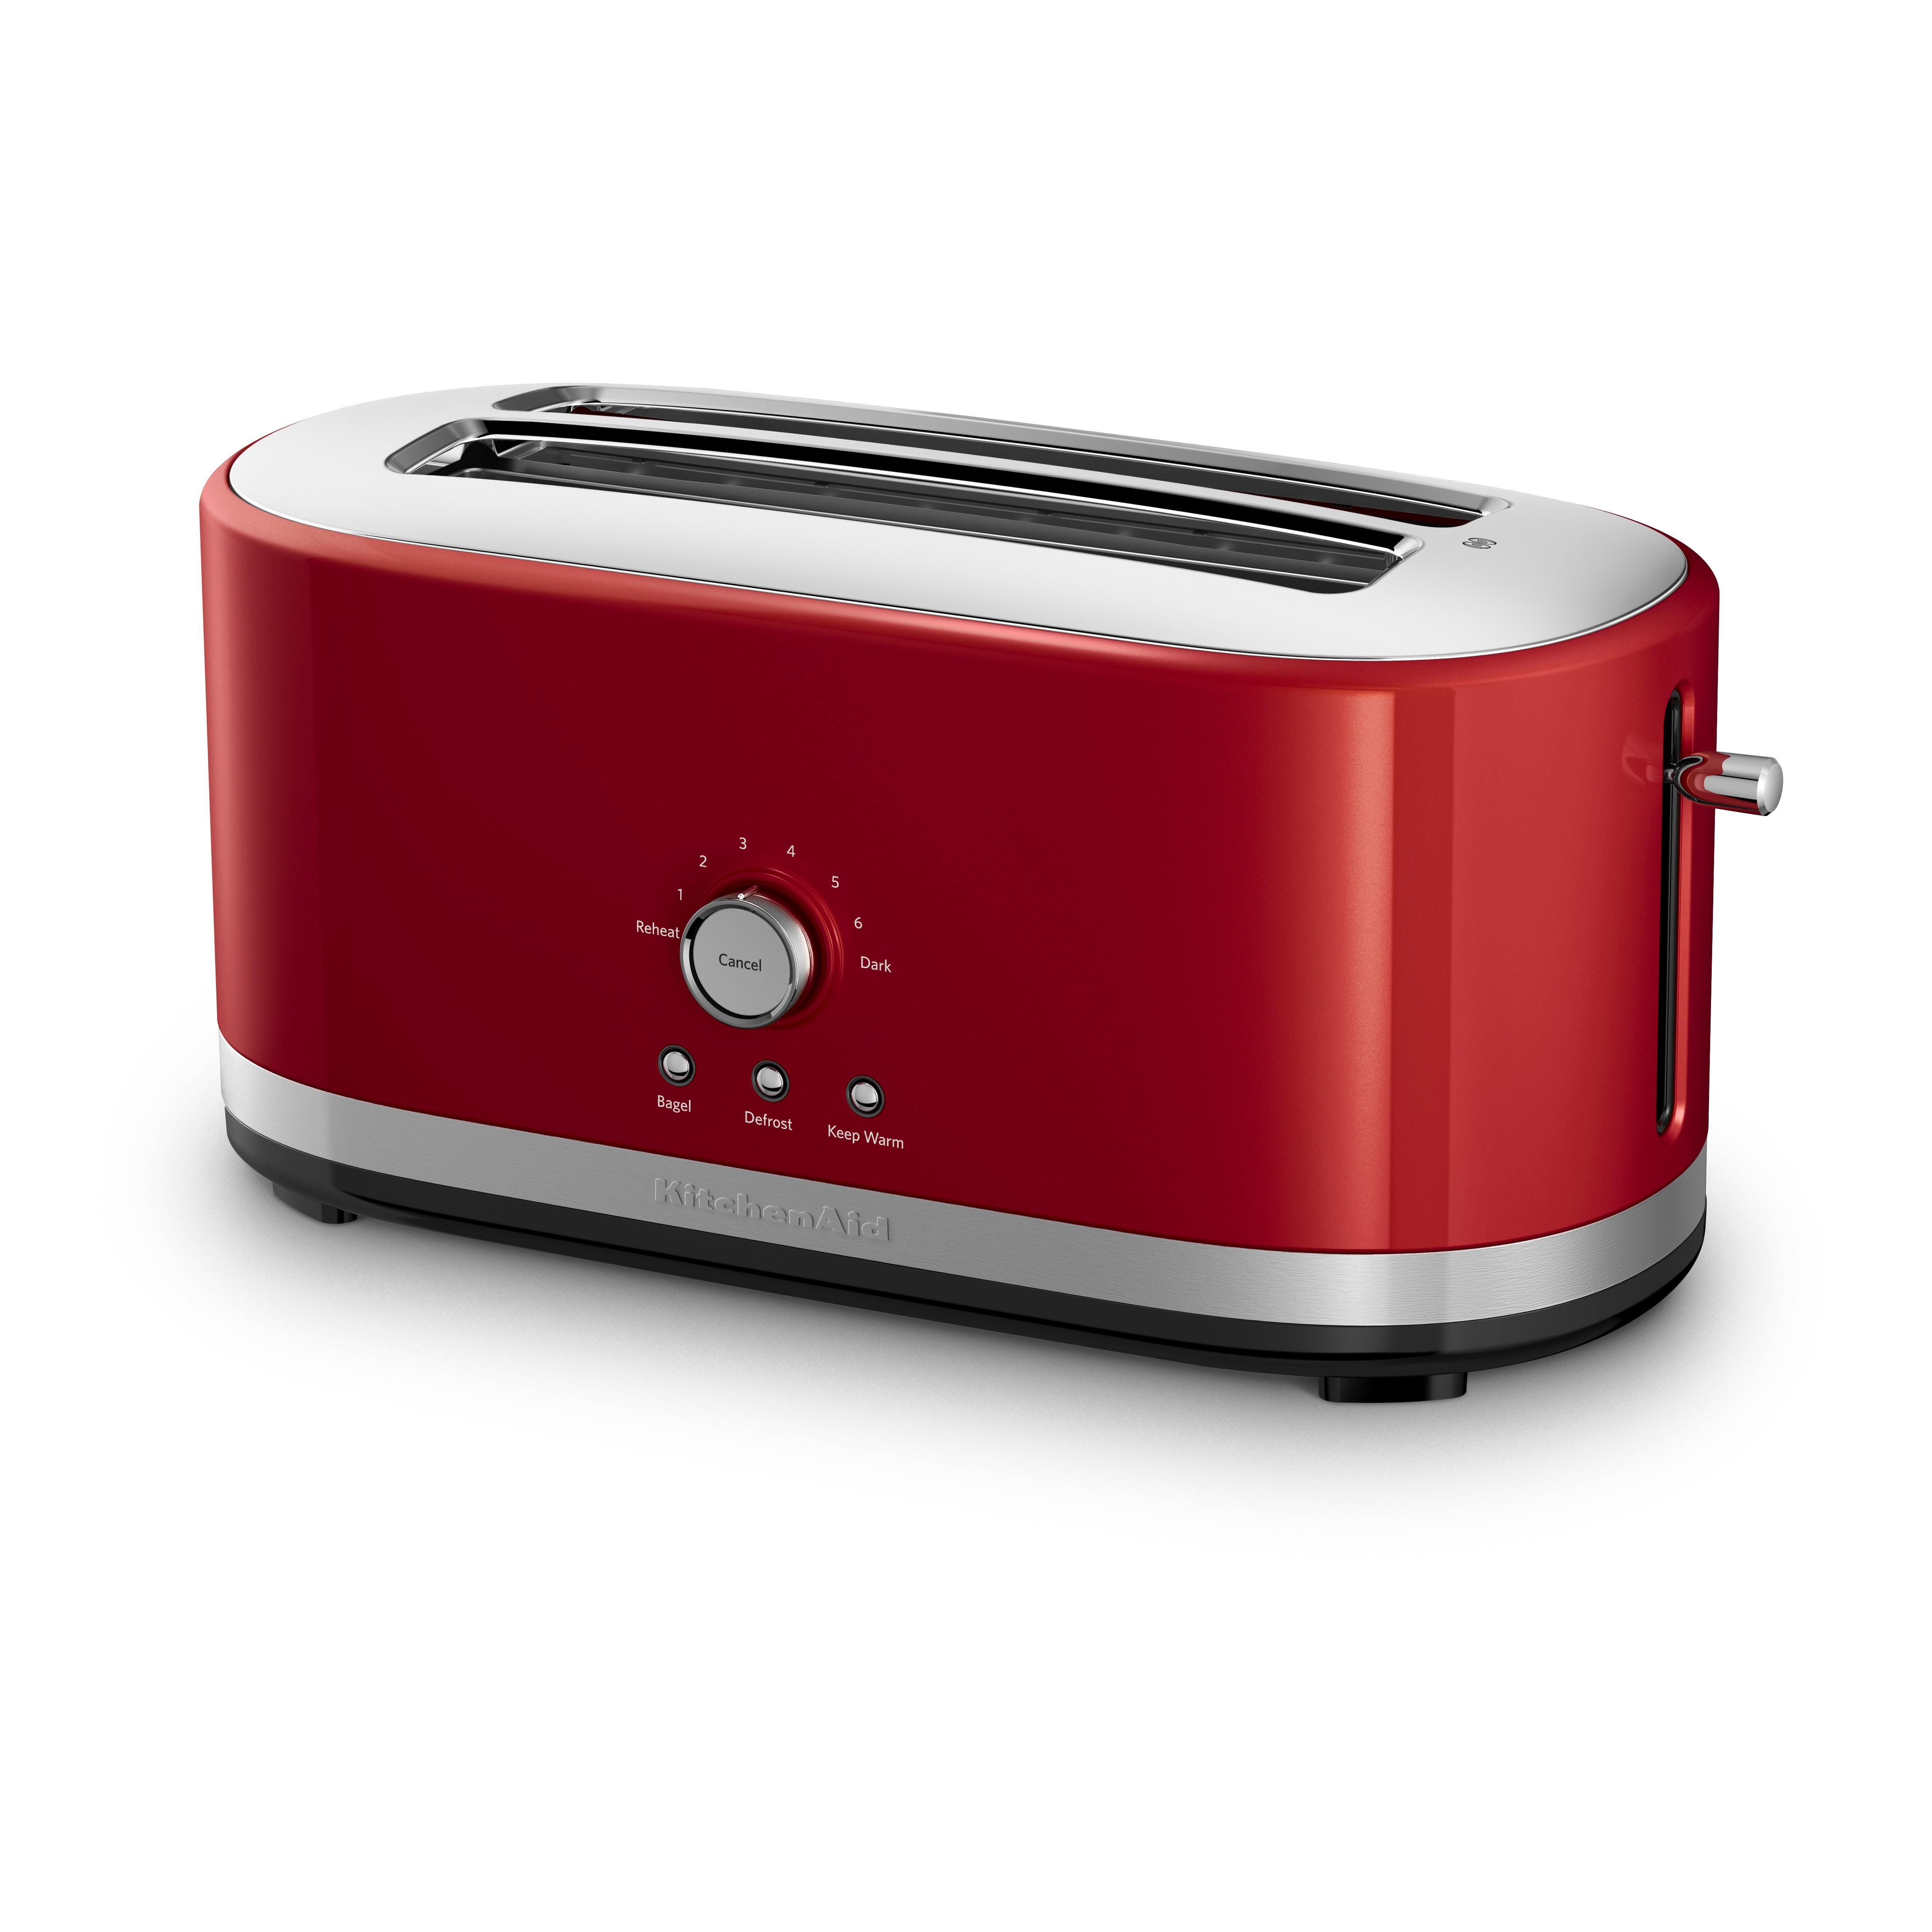 kitchenaid 4 slice toaster. view larger kitchenaid 4 slice toaster n